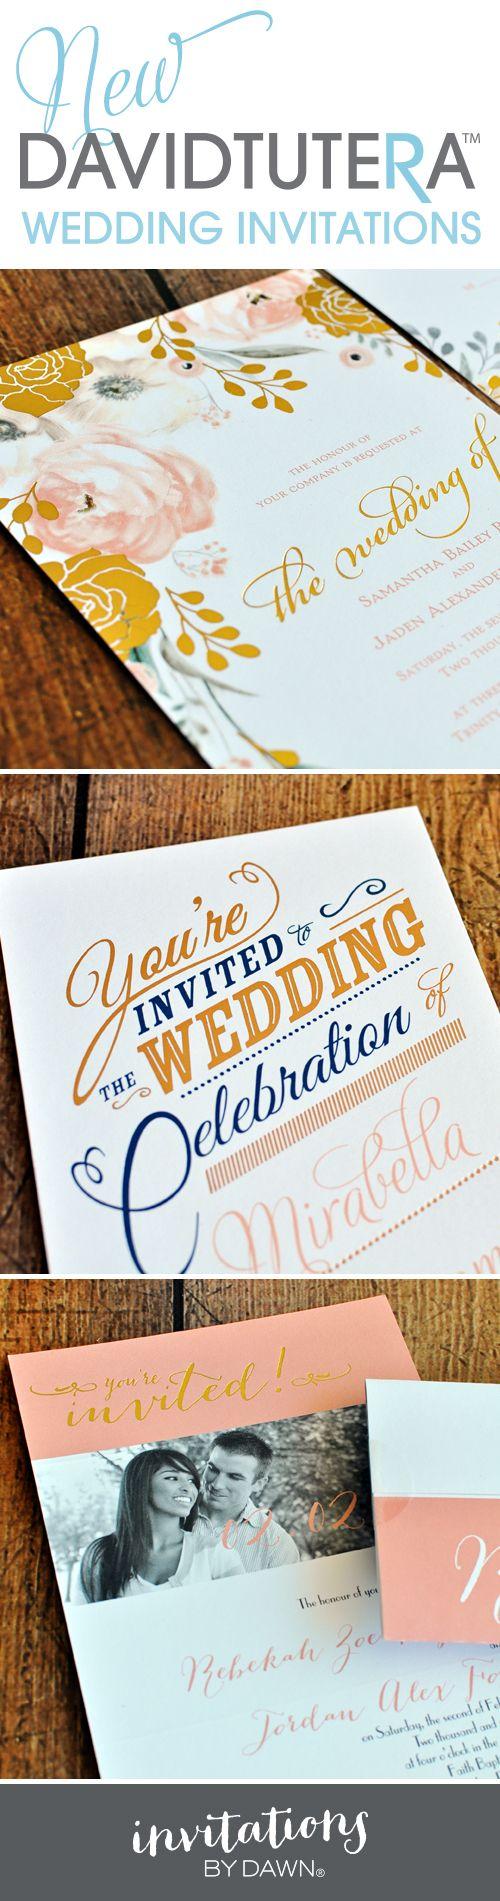 best black tie wedding images on pinterest black tie wedding